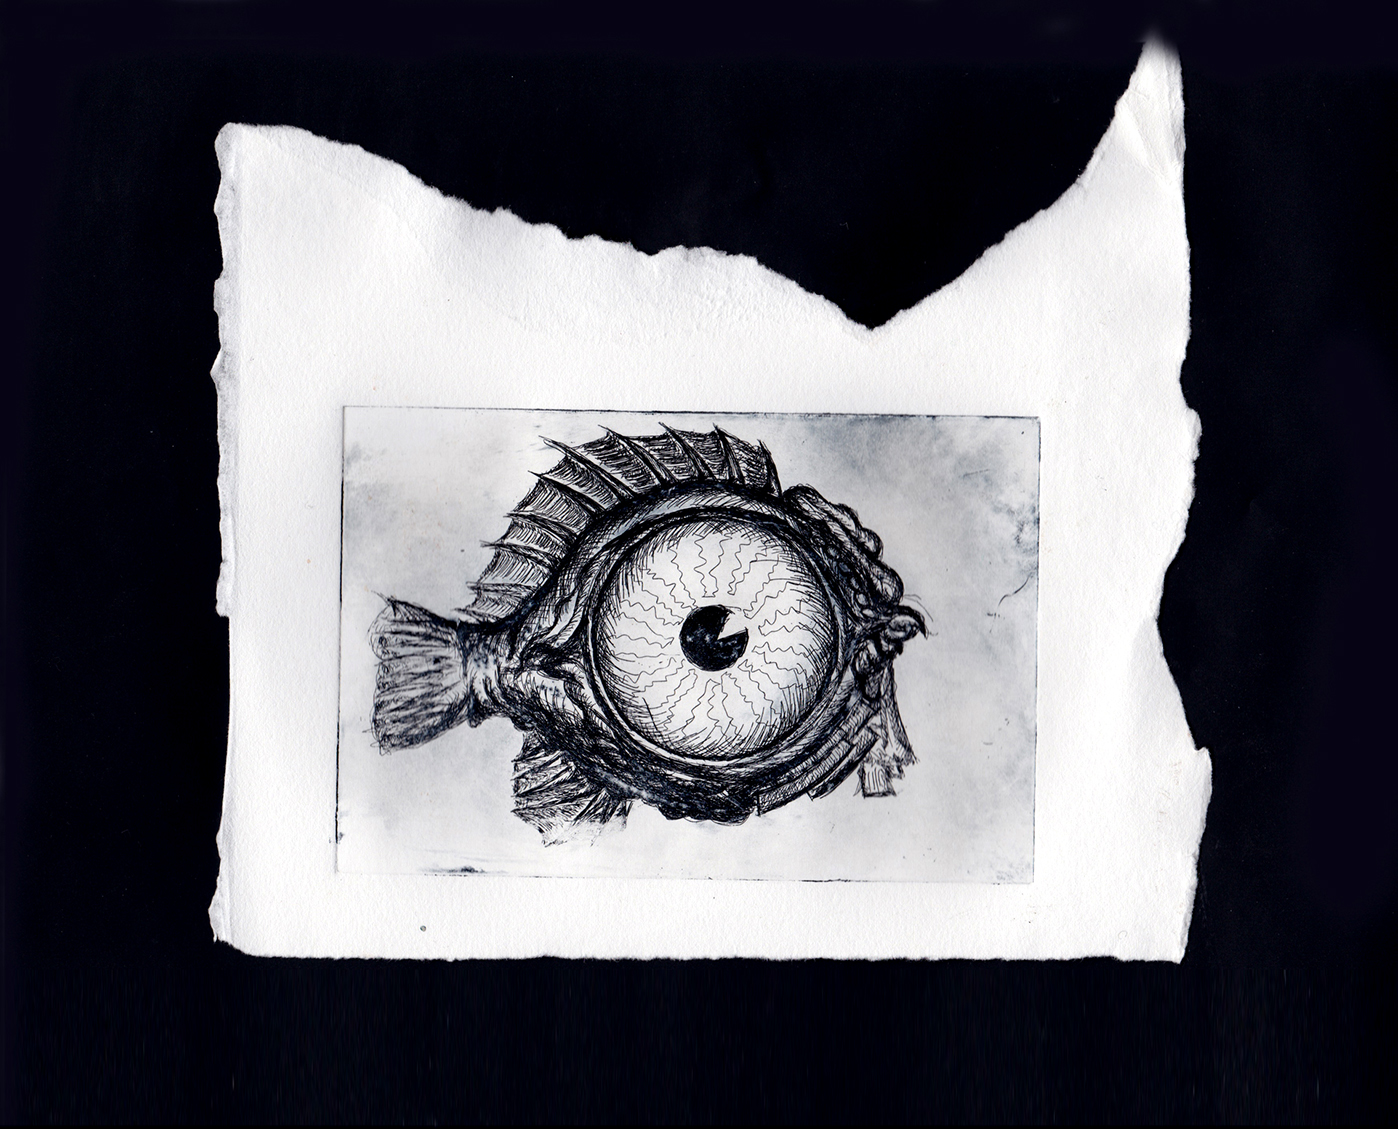 Malene Kyed Blowfish kunst art copper etching maler